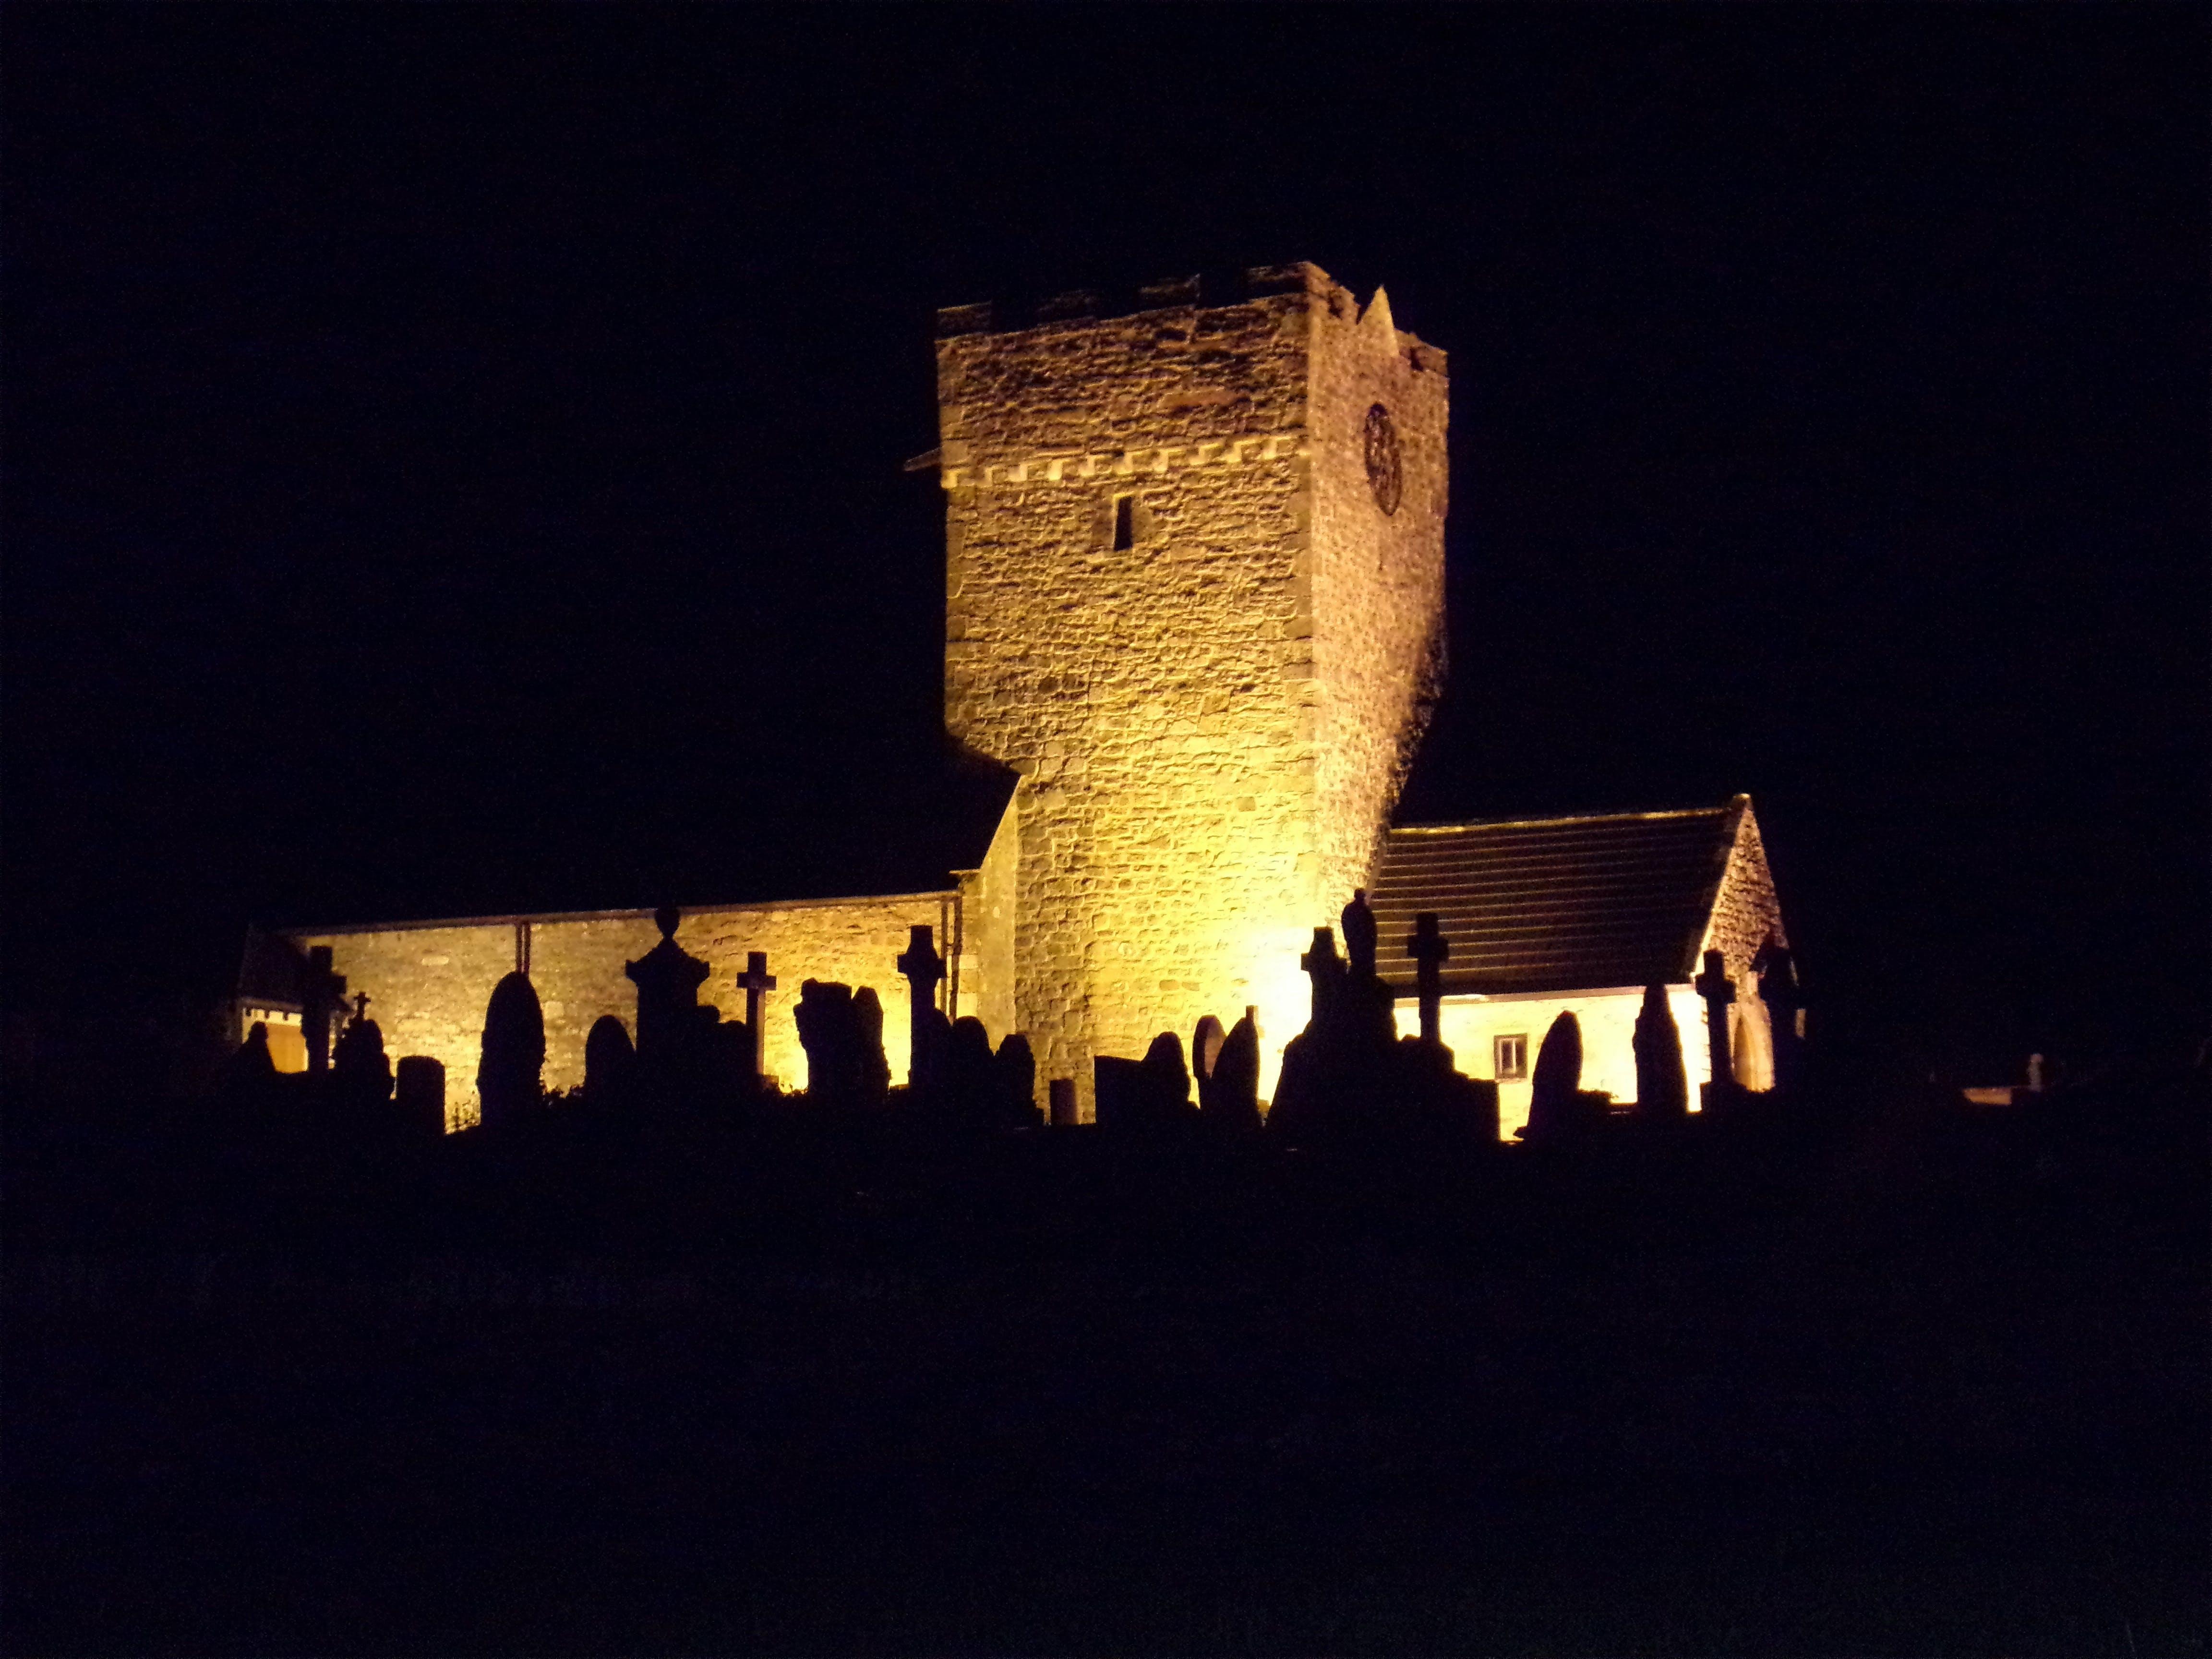 Free stock photo of church, church all lit up, church at night, church building